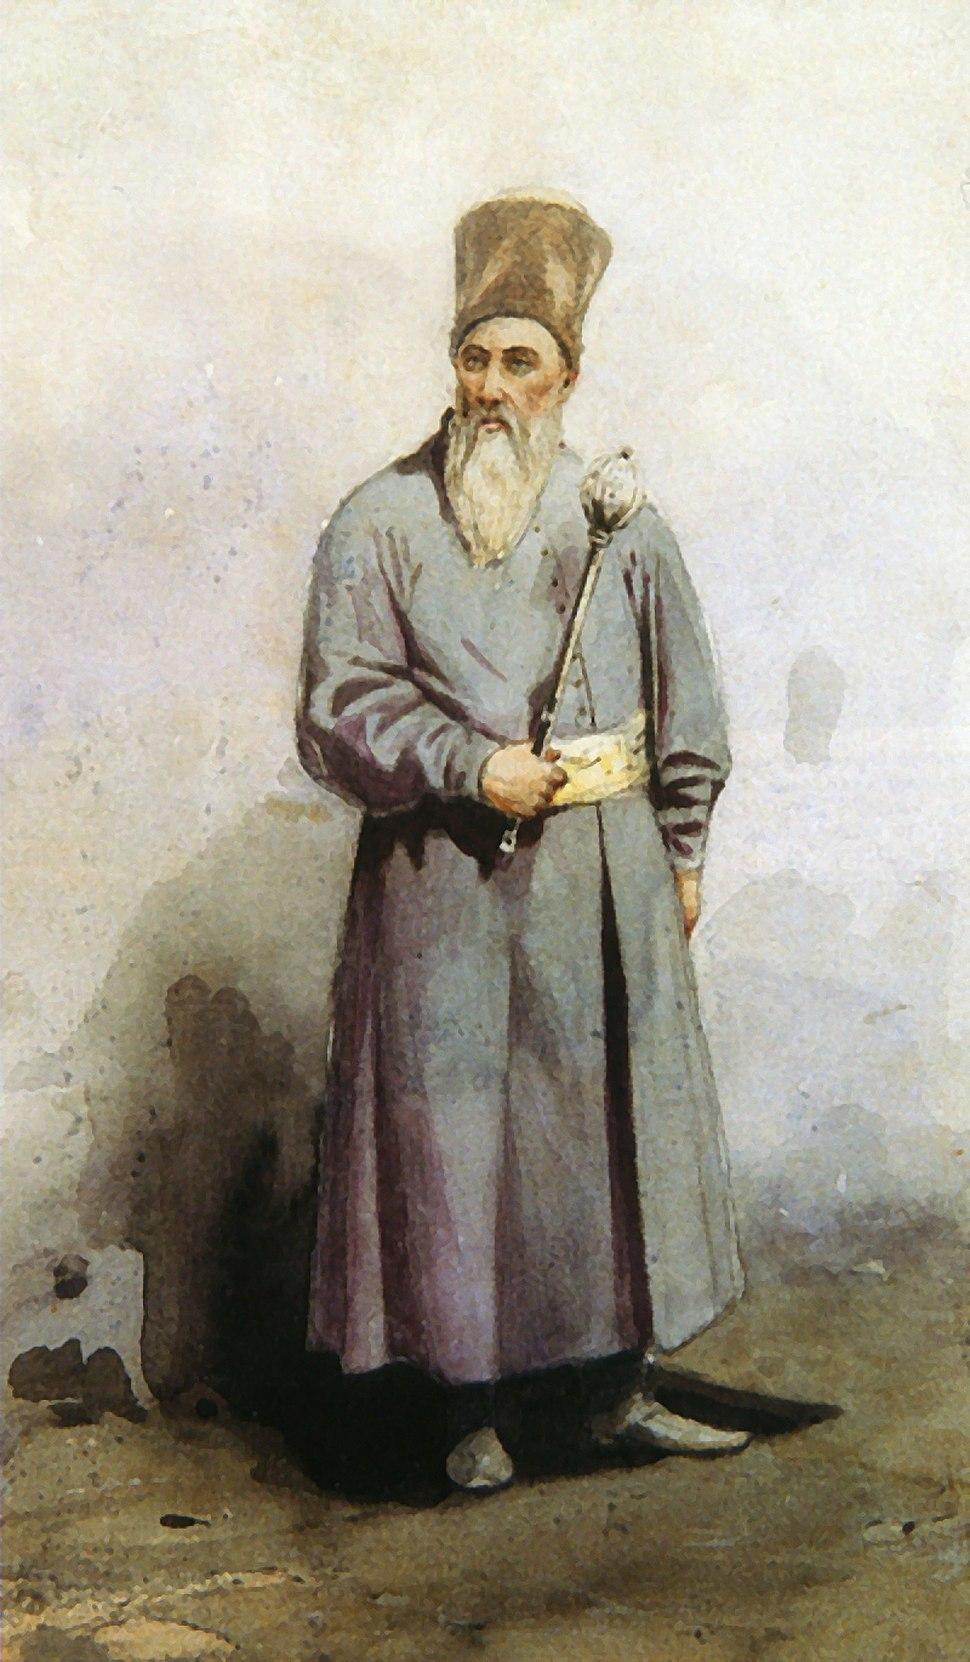 Konashevych-Sahaidachny by Vasylkivsky